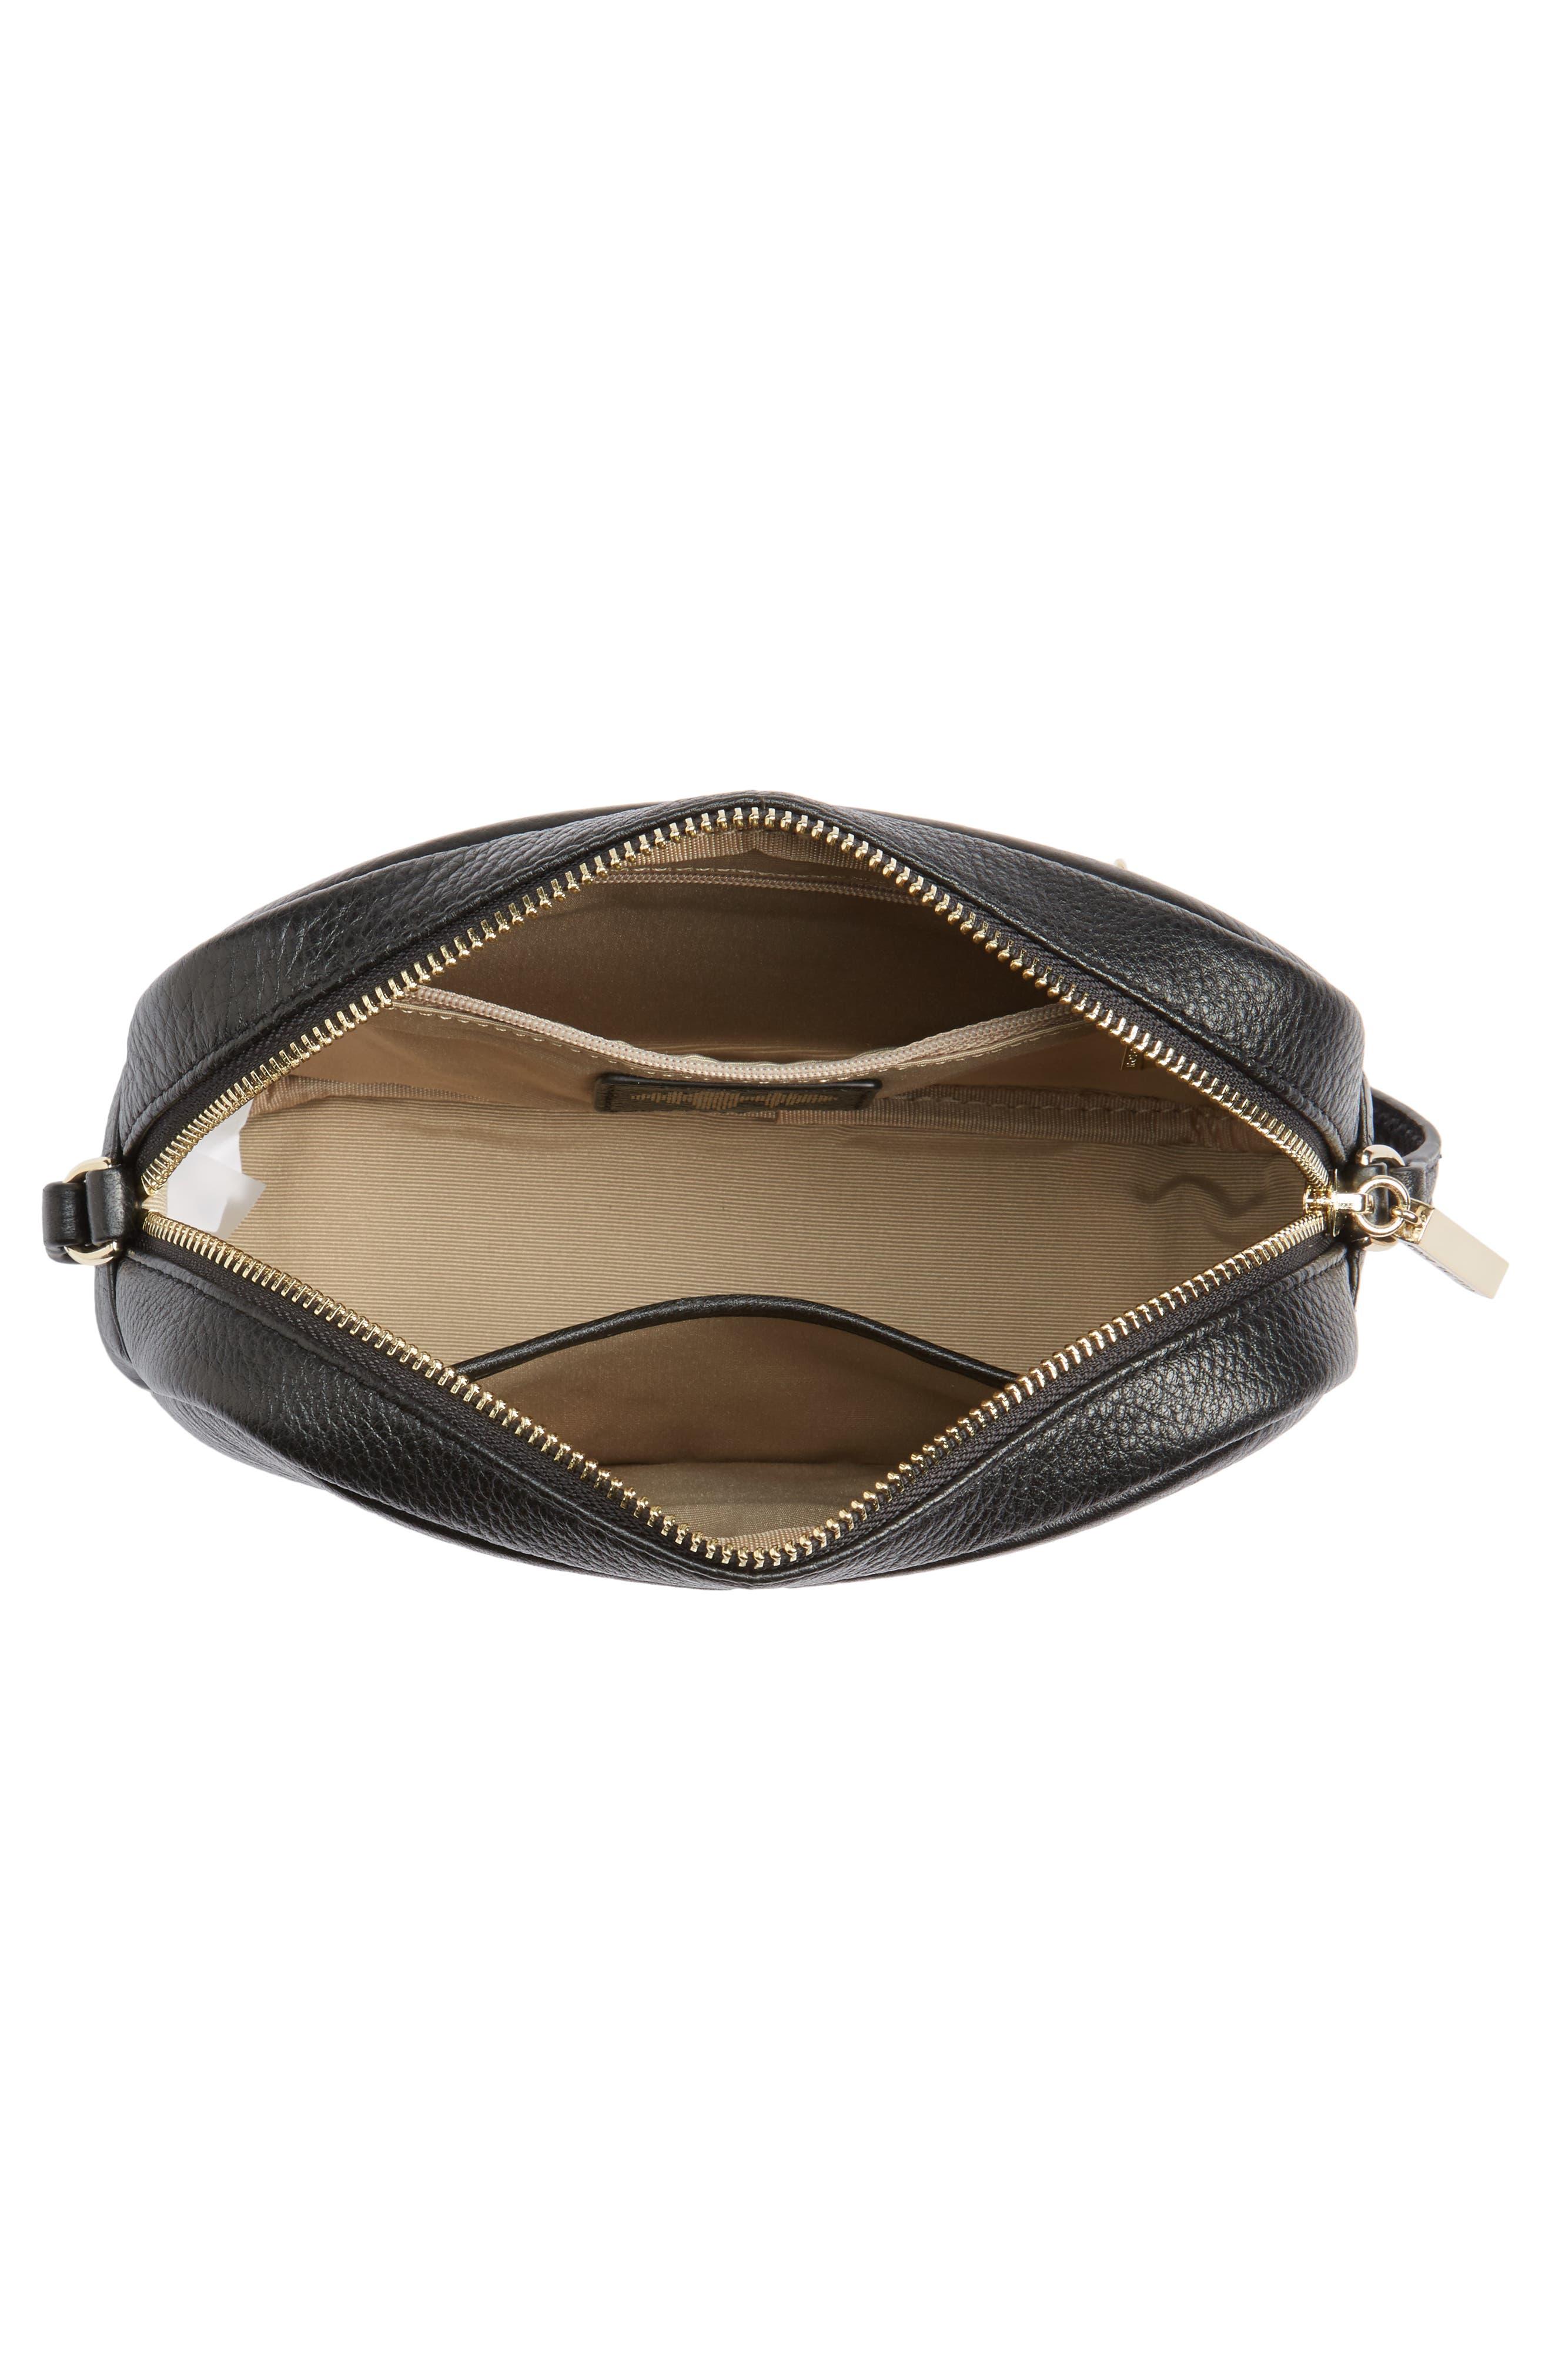 Céline Dion Adagio Leather Camera Crossbody Bag,                             Alternate thumbnail 10, color,